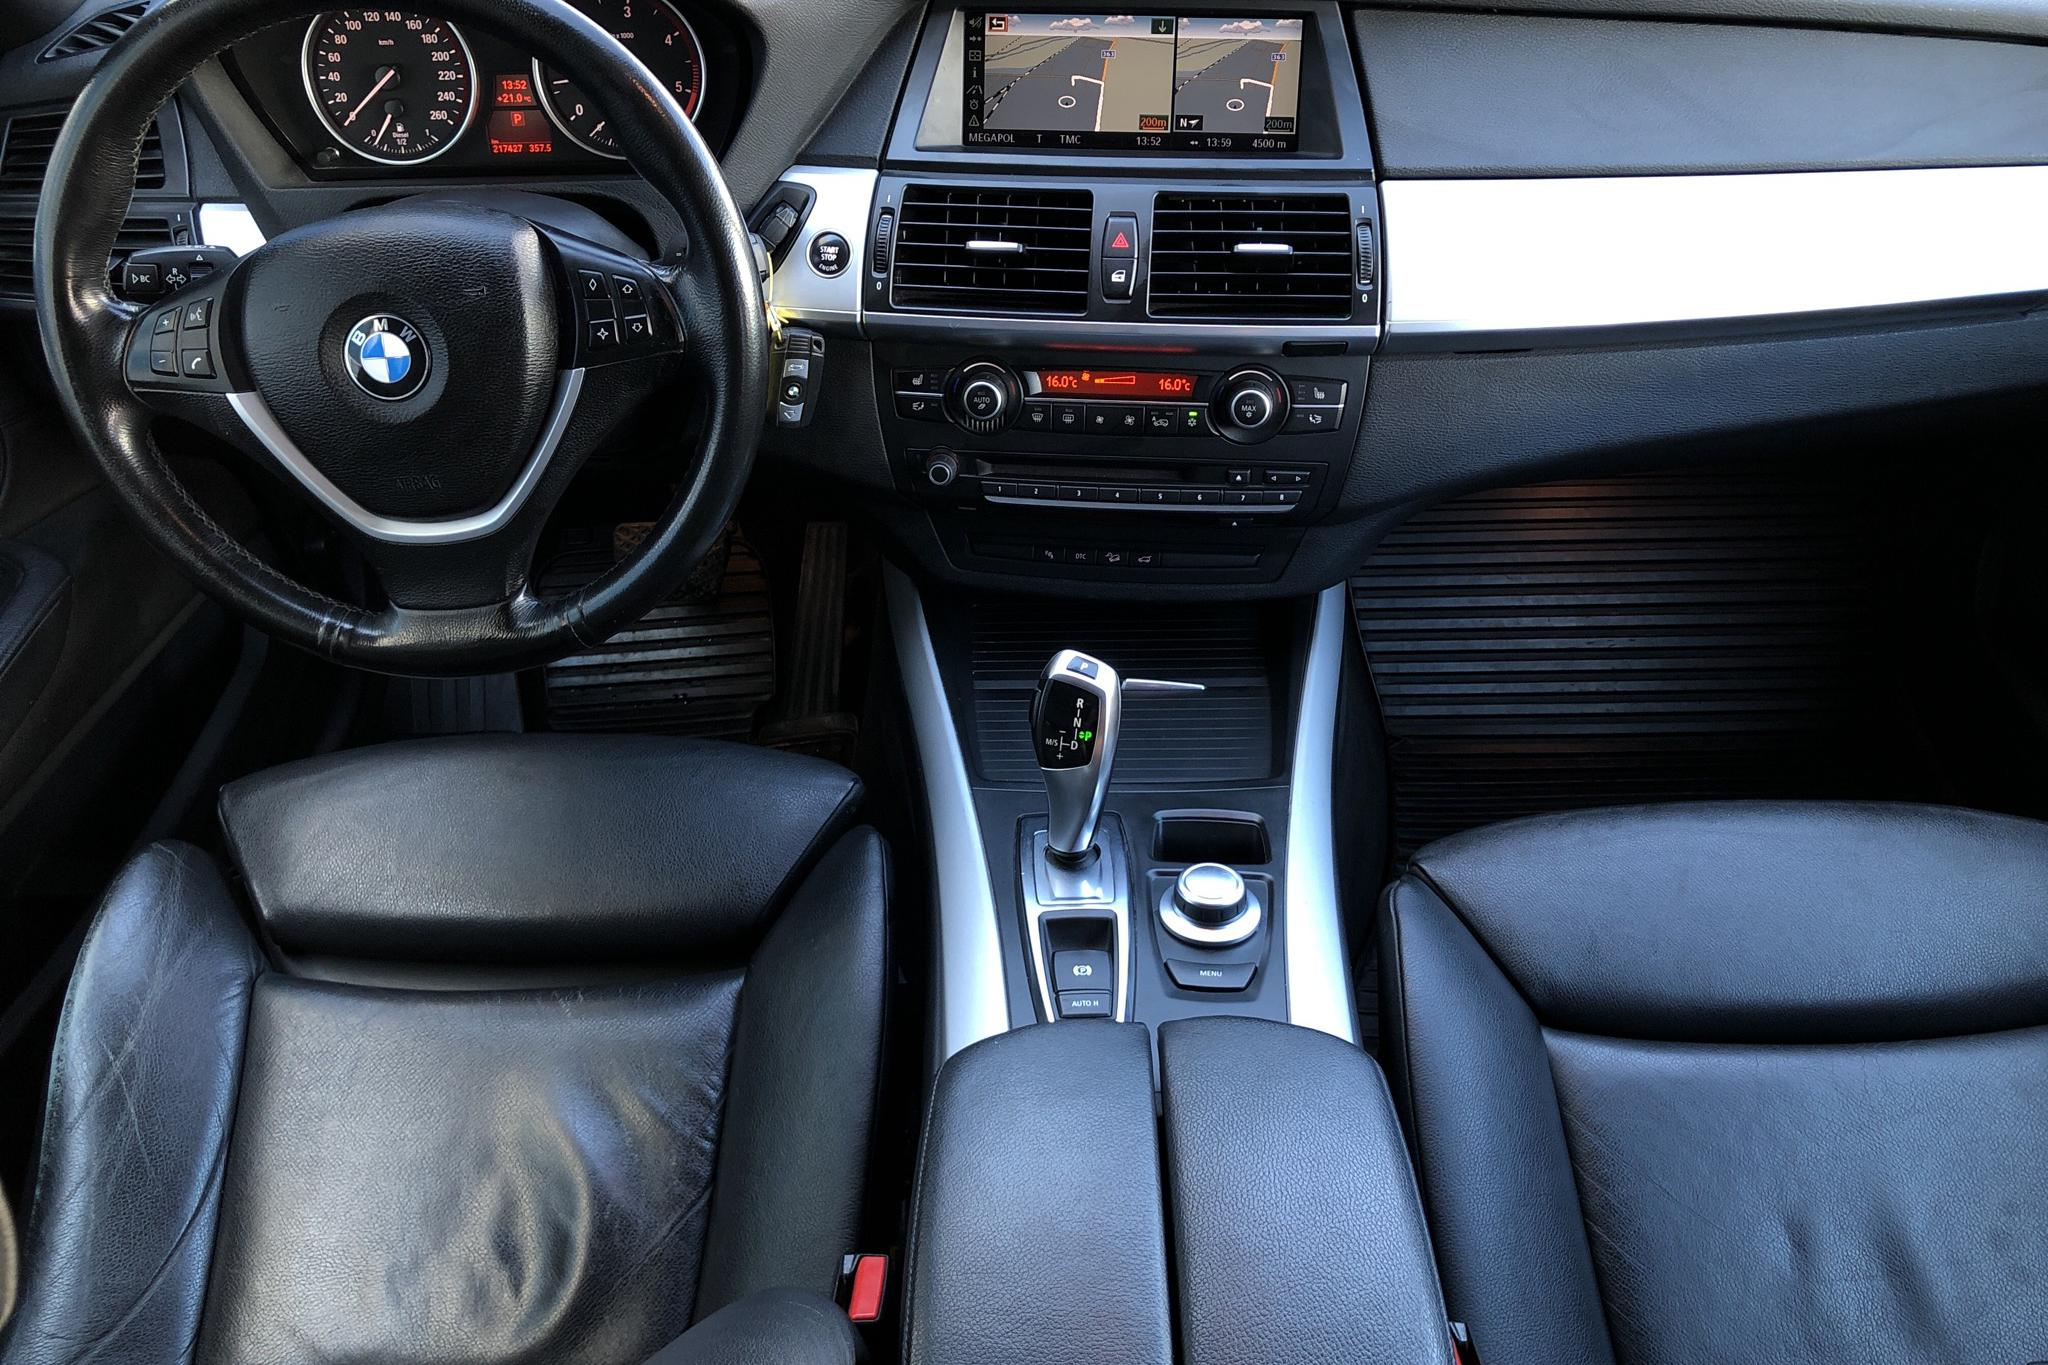 BMW X5 xDrive3.0dA, E70 (235hk) - 210 000 km - Automatic - gray - 2009